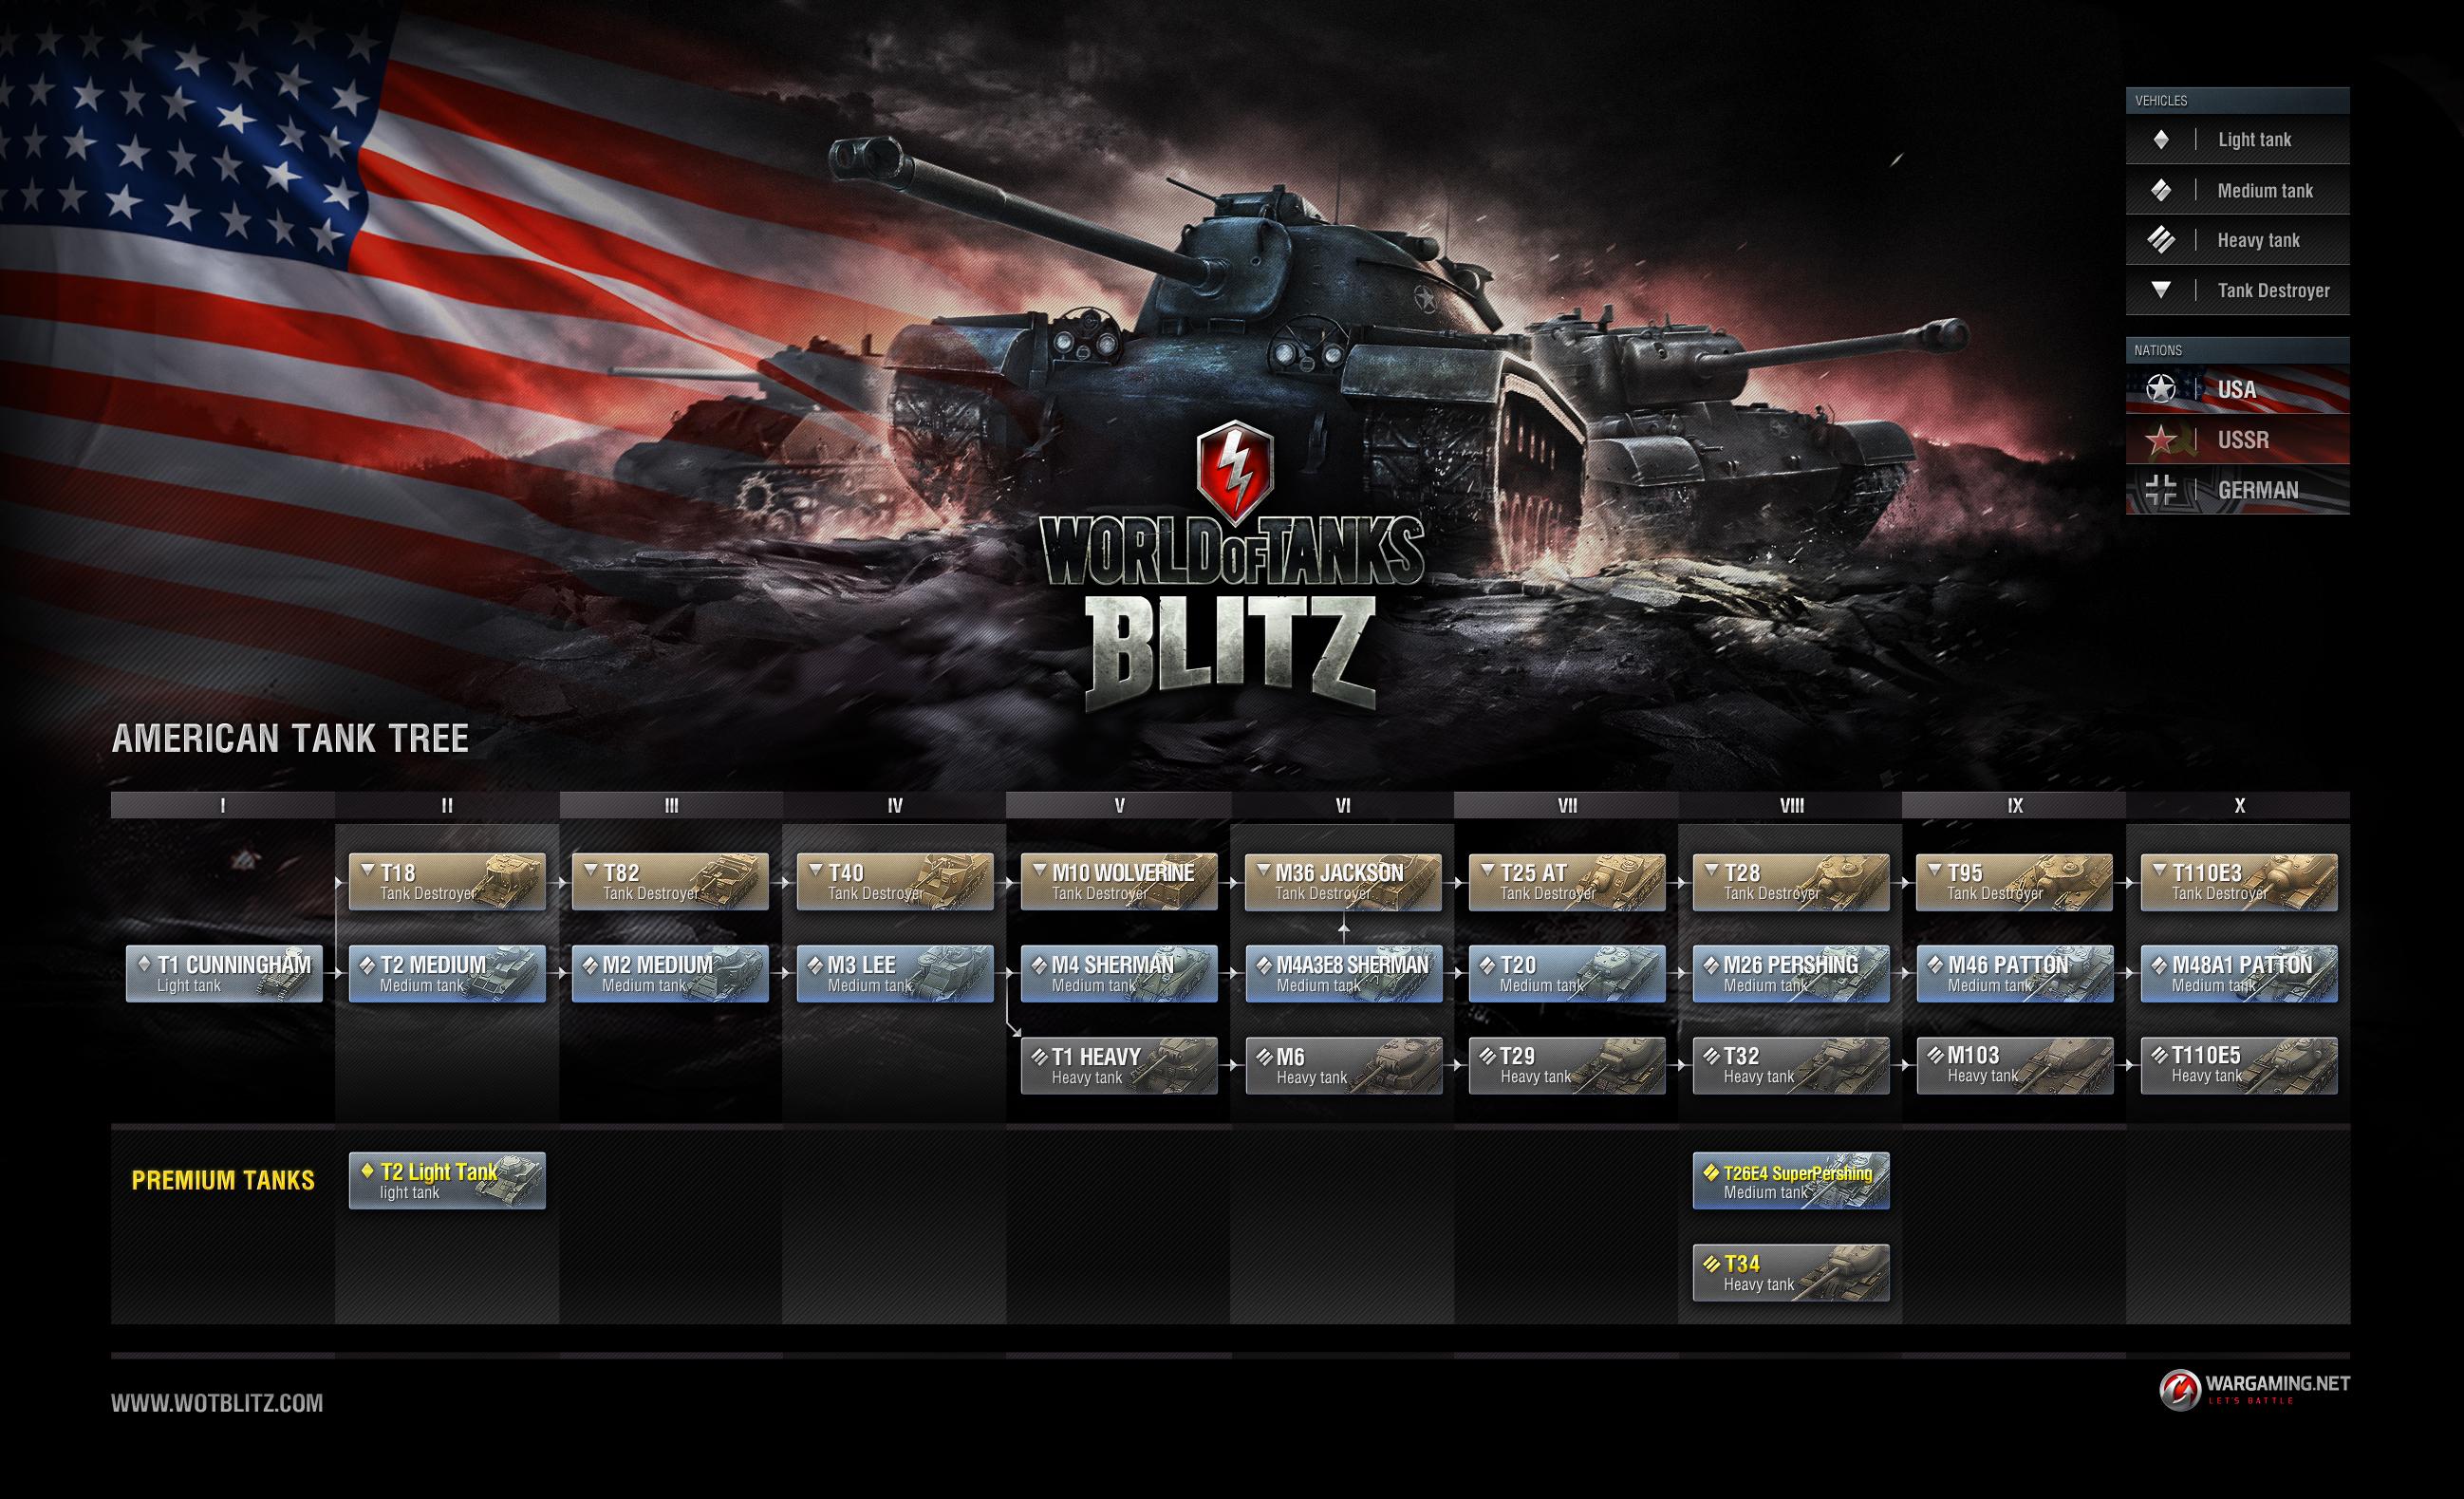 World of tanks crew skills